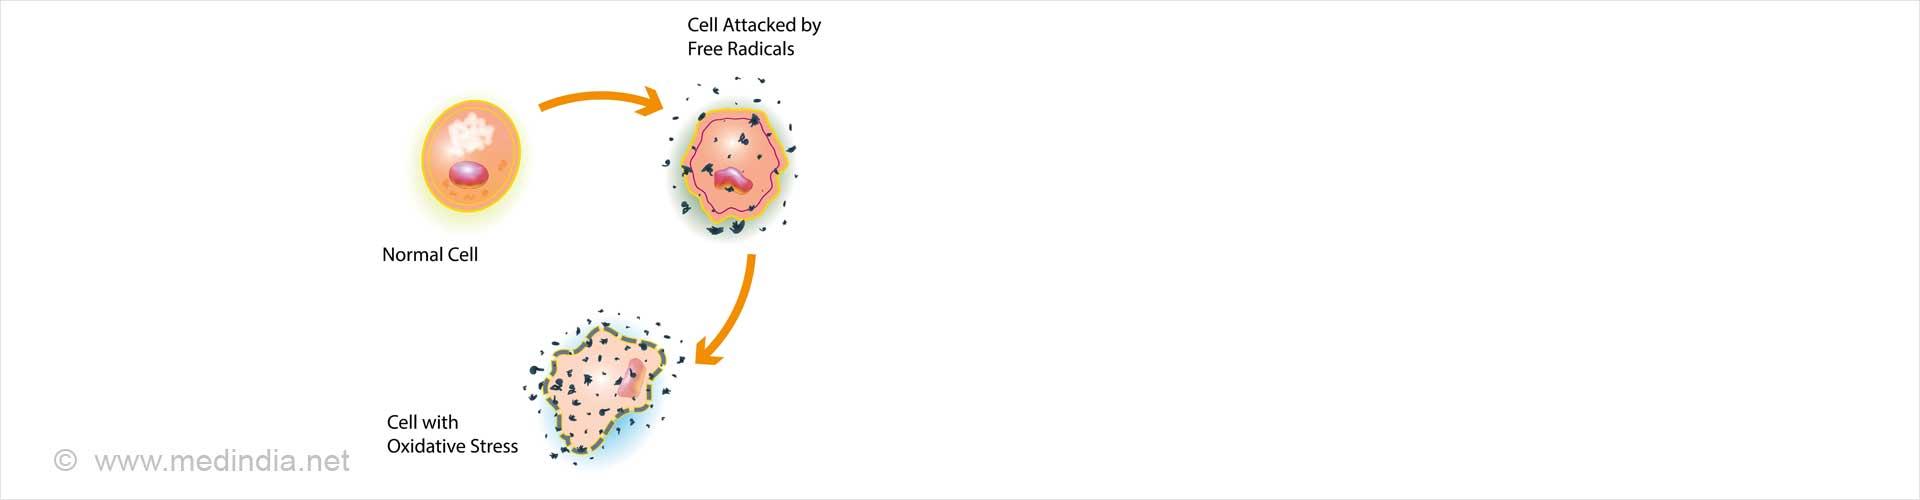 Oxidative Stress / Free Radicals Cell Injury